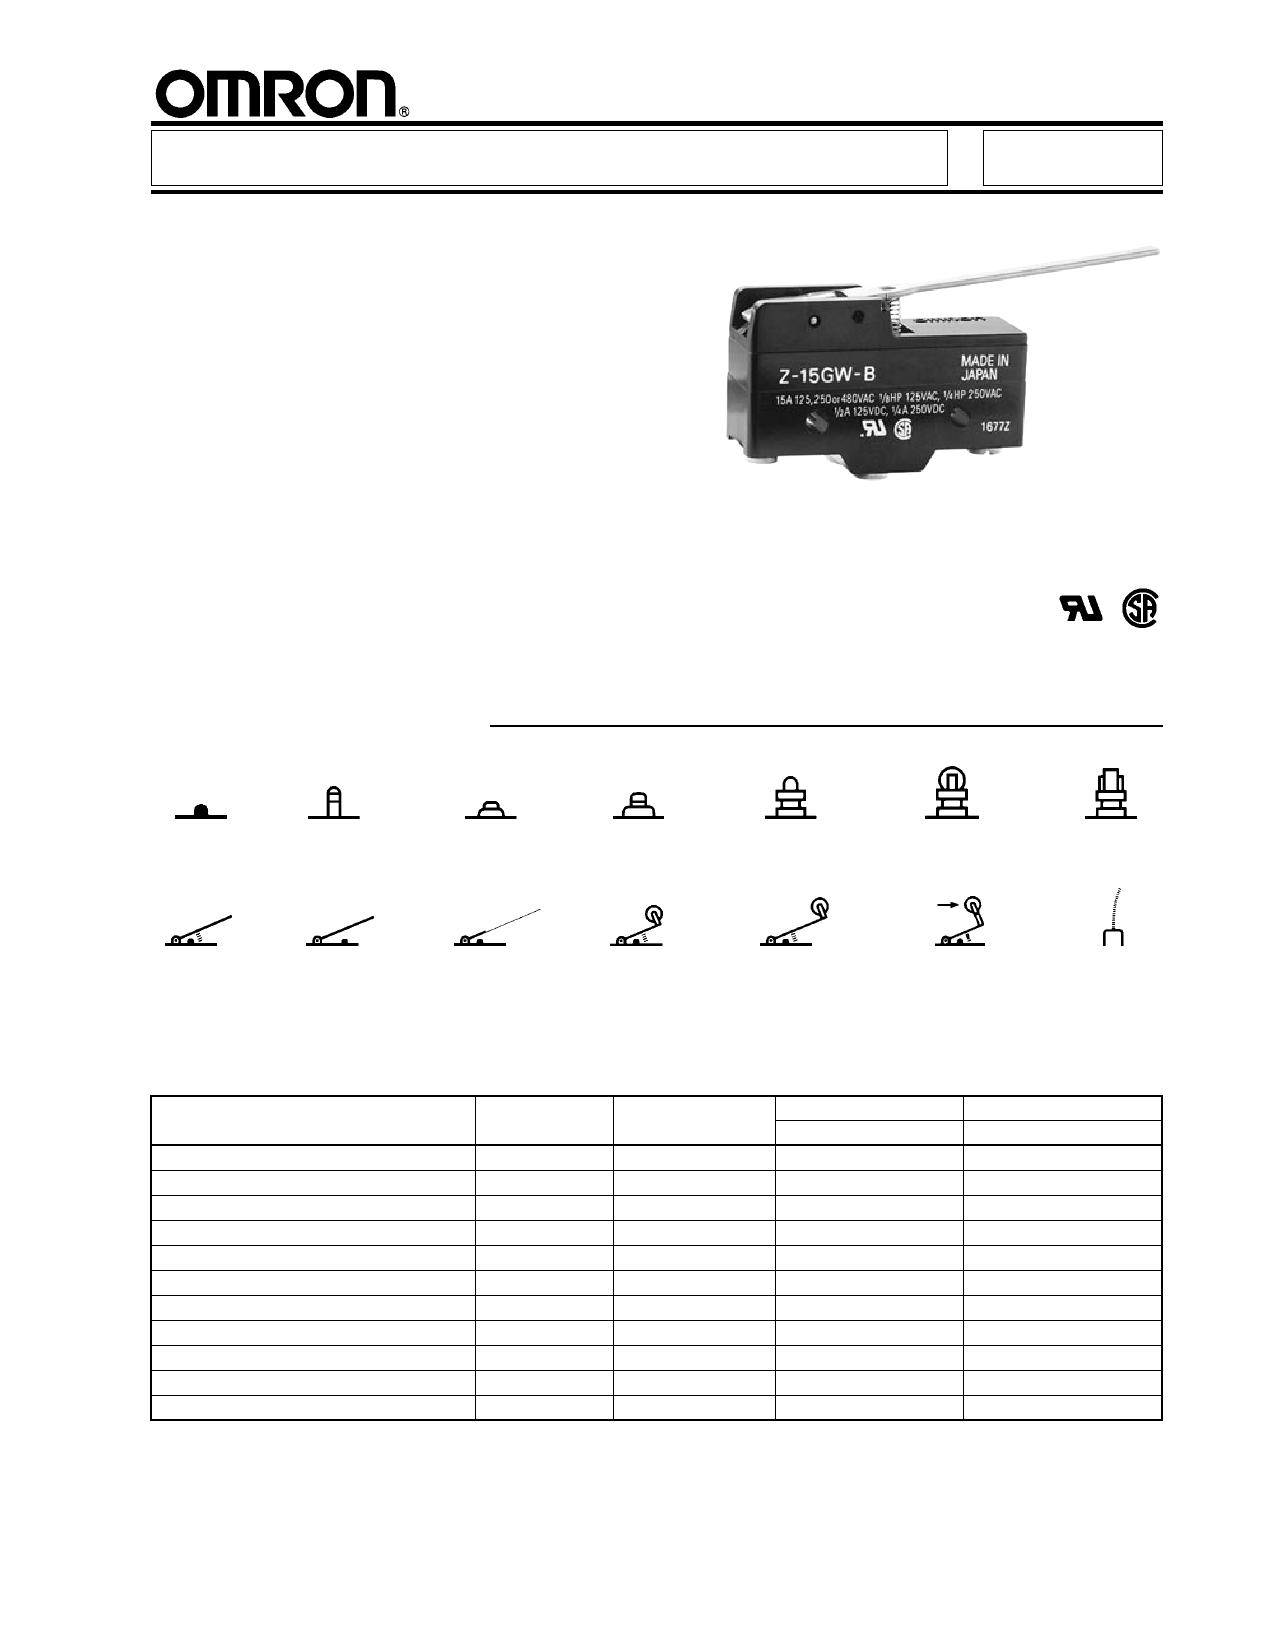 Z-15GS-B datasheet